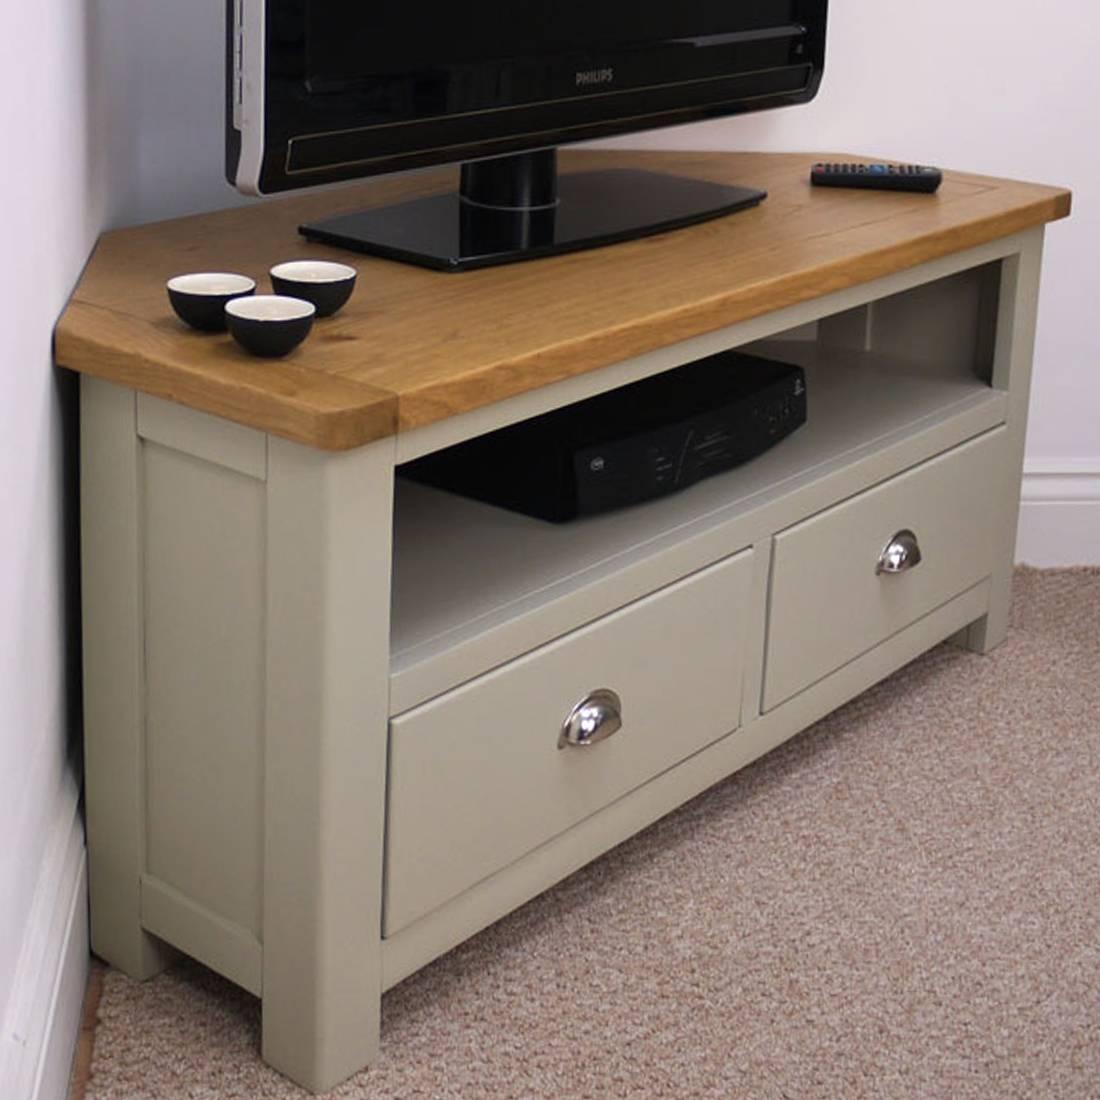 Aspen Oak Corner Tv Unit / Painted Tv Stand / Sage Grey With Oak with Grey Corner Tv Stands (Image 1 of 15)